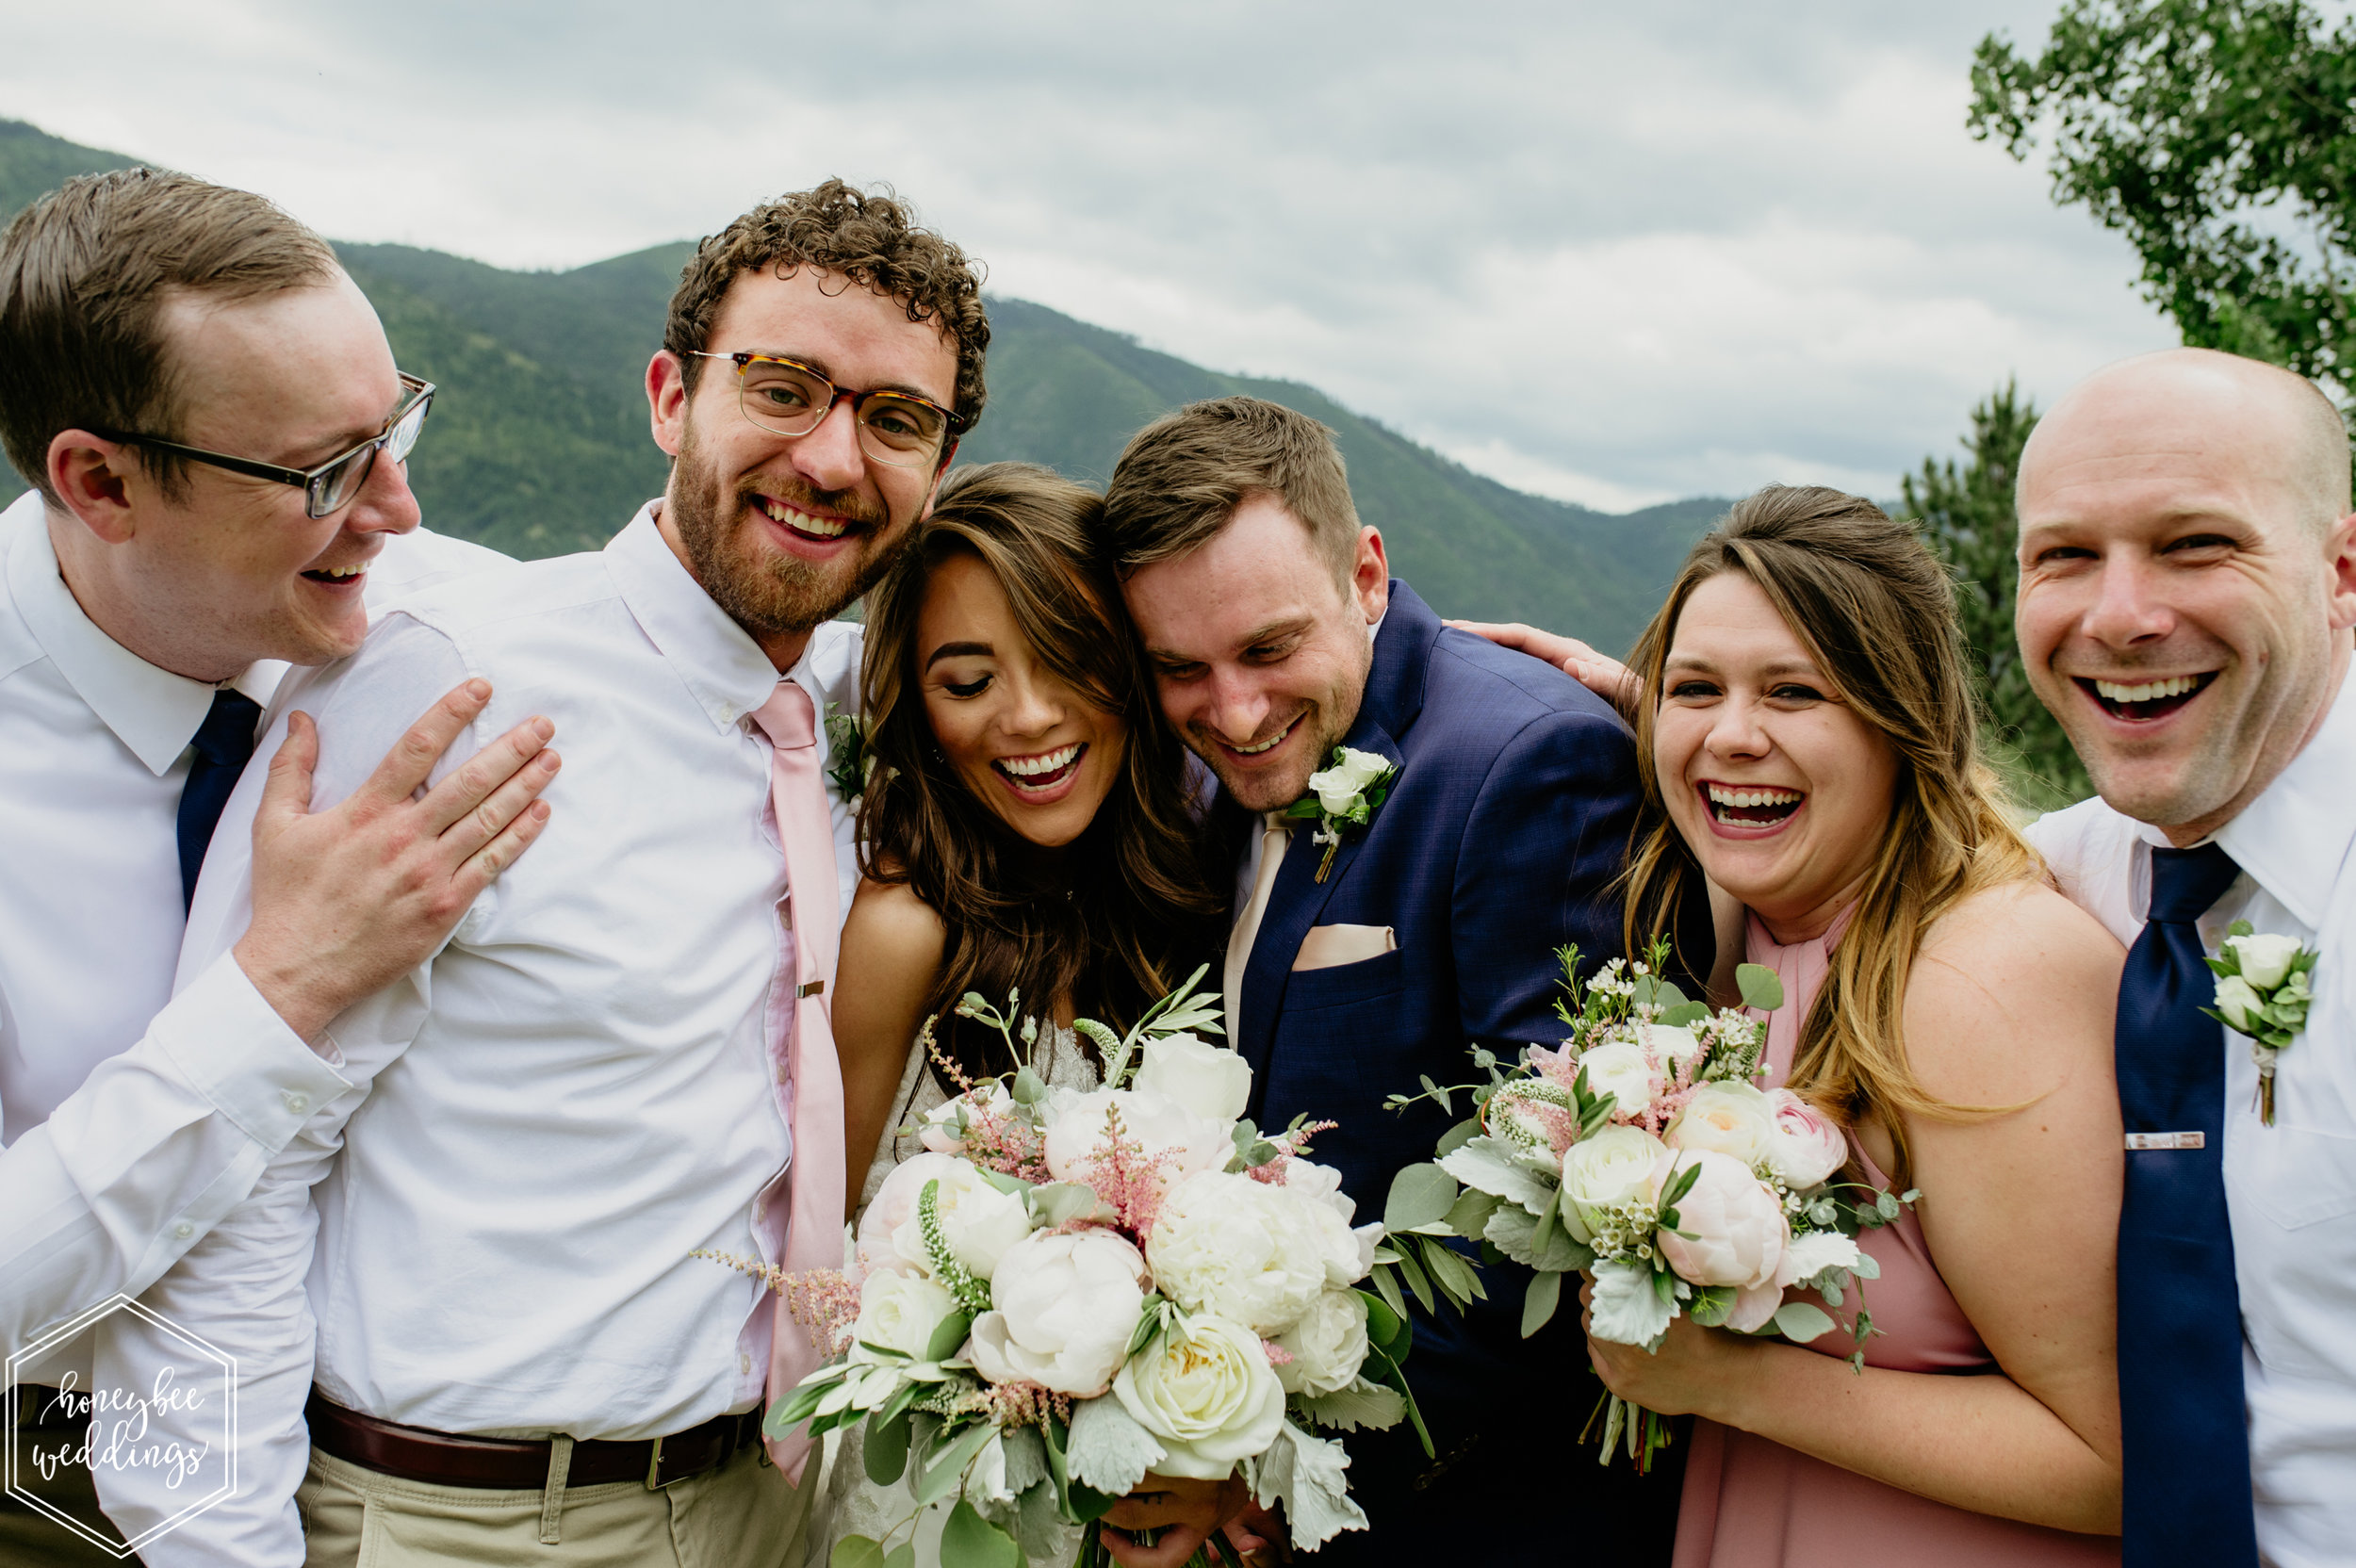 236Montana Wedding Photographer_Missoula Wedding_Honeybee Weddings_Devlin & Jacob_June 22, 2019-2943.jpg